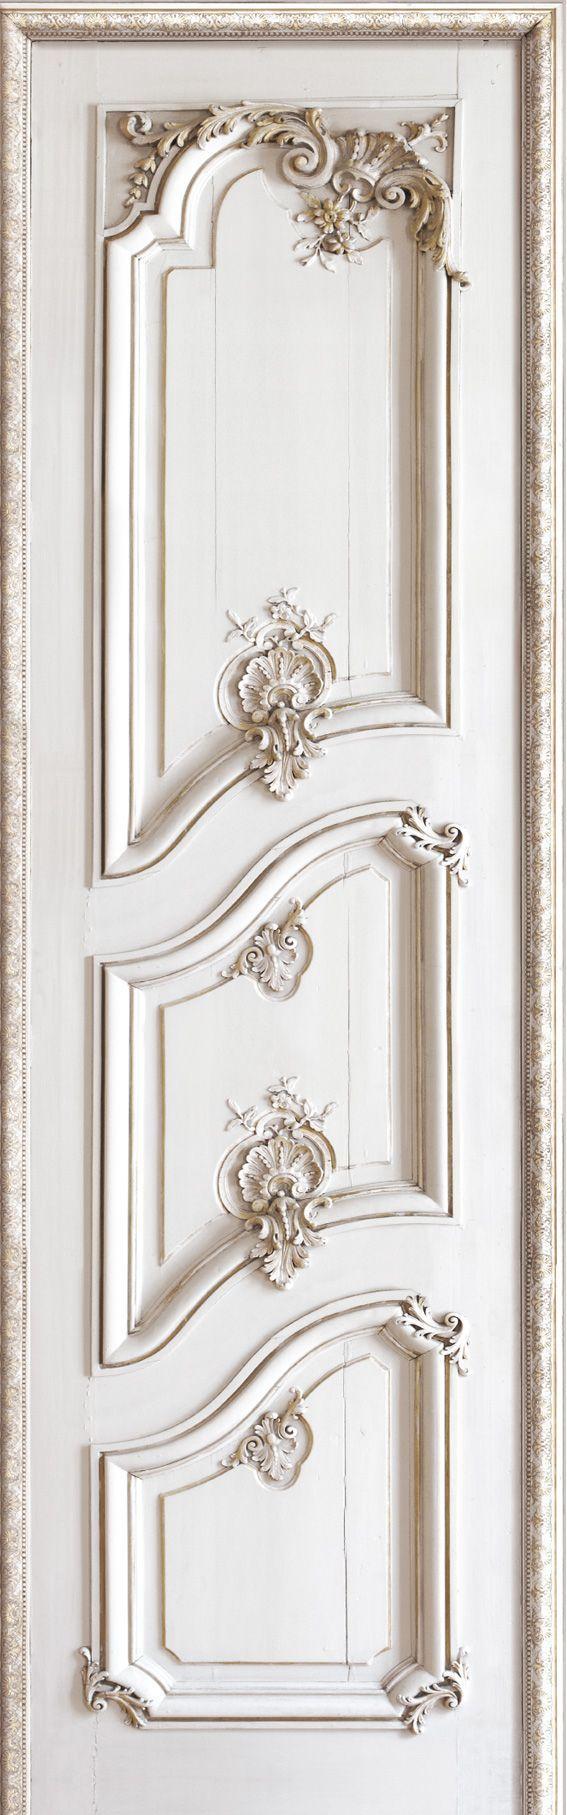 French Trompe loeil wallpaper by Christophe Koziel - Left panelled door